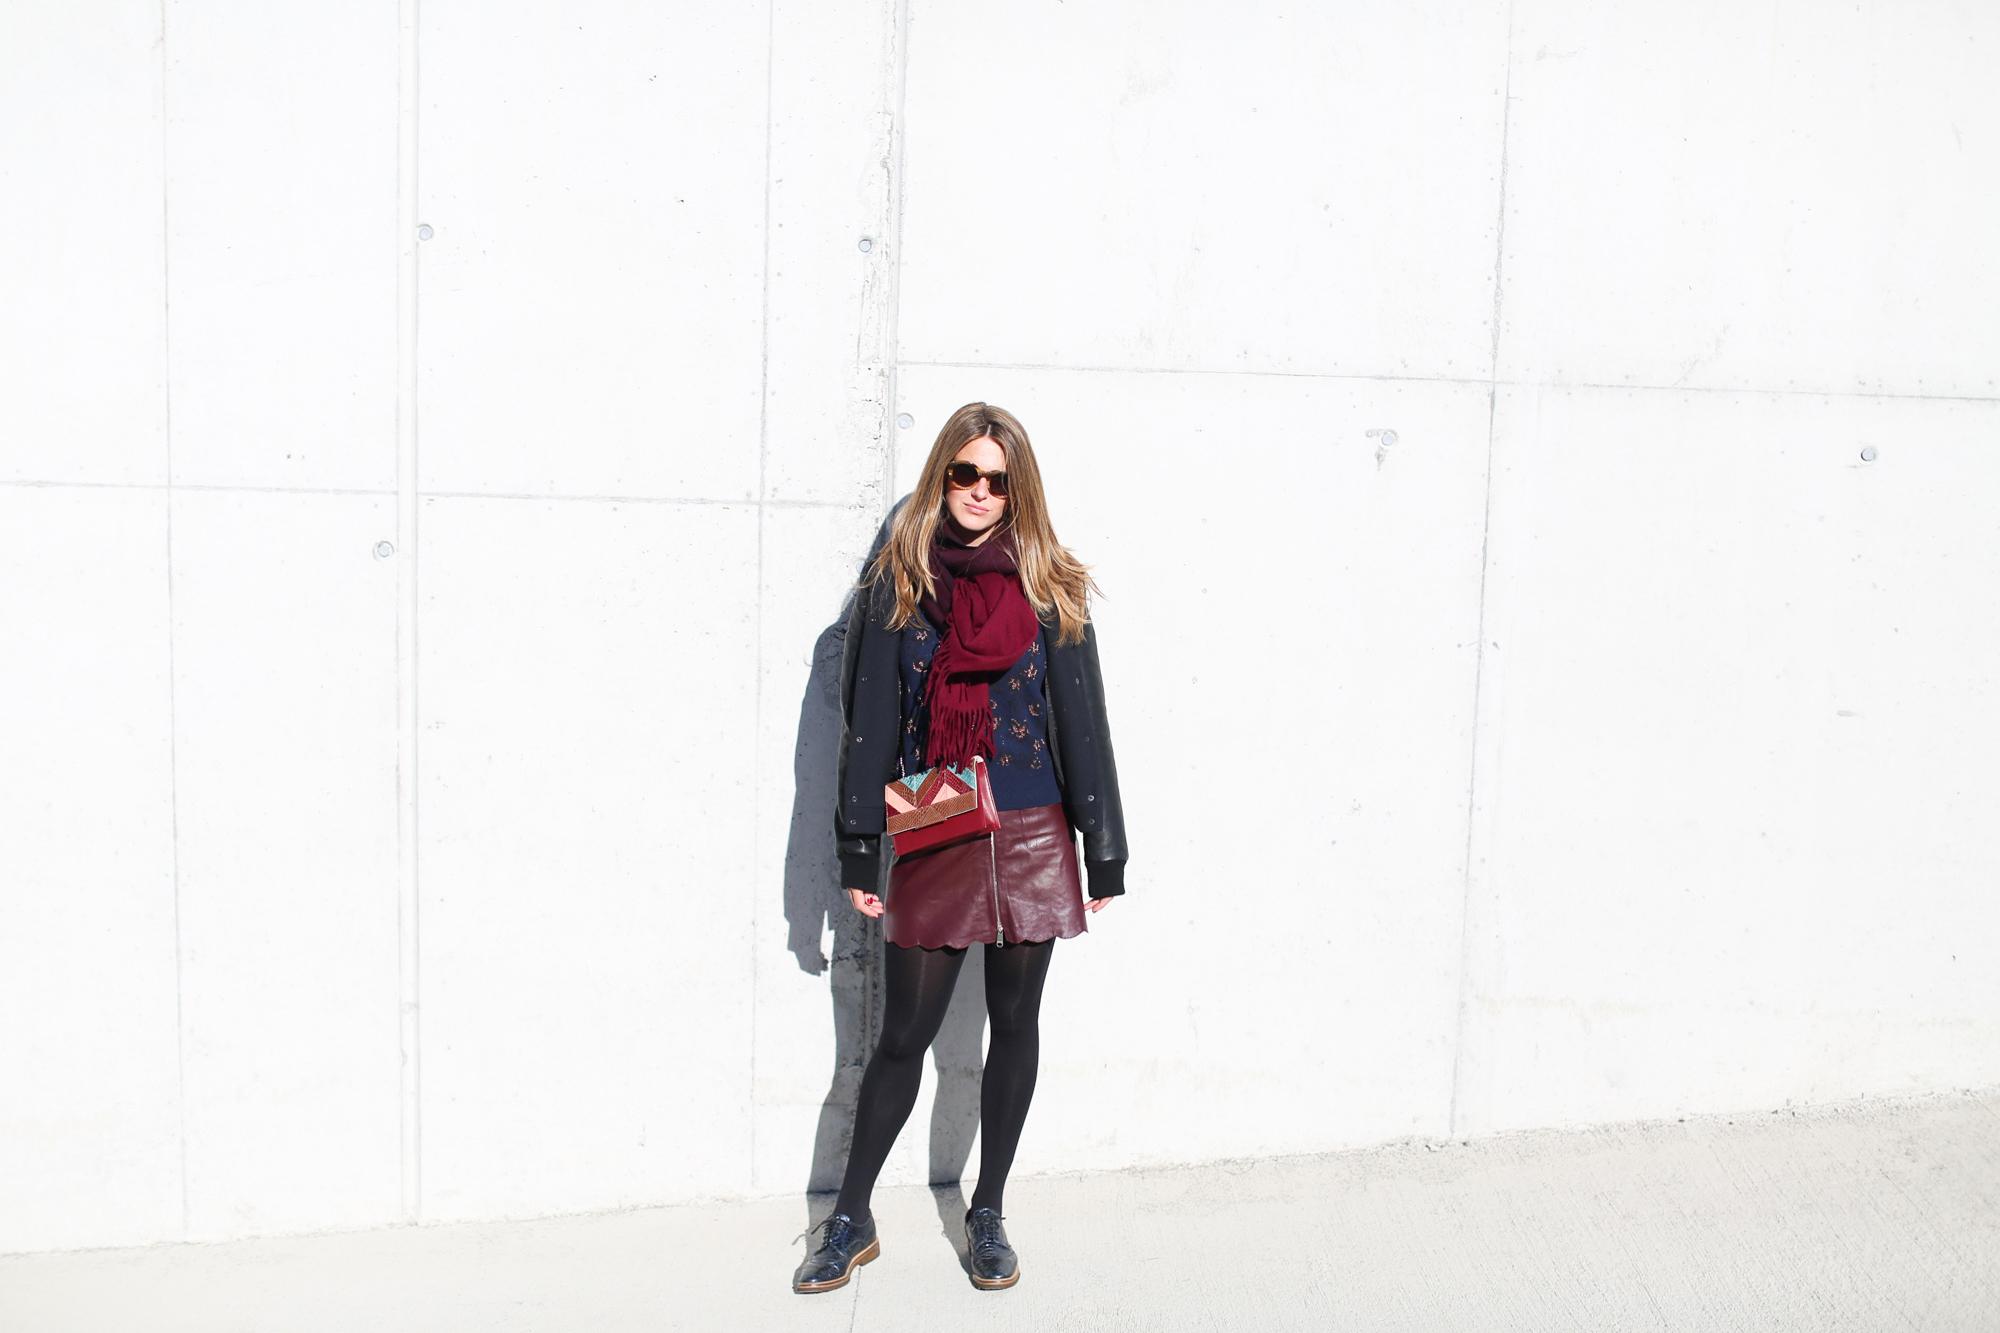 Clochet_fashionblogger_streetstyle_andotherstories_metallicflowersknit_heroscarf_leatherminiskirt-3